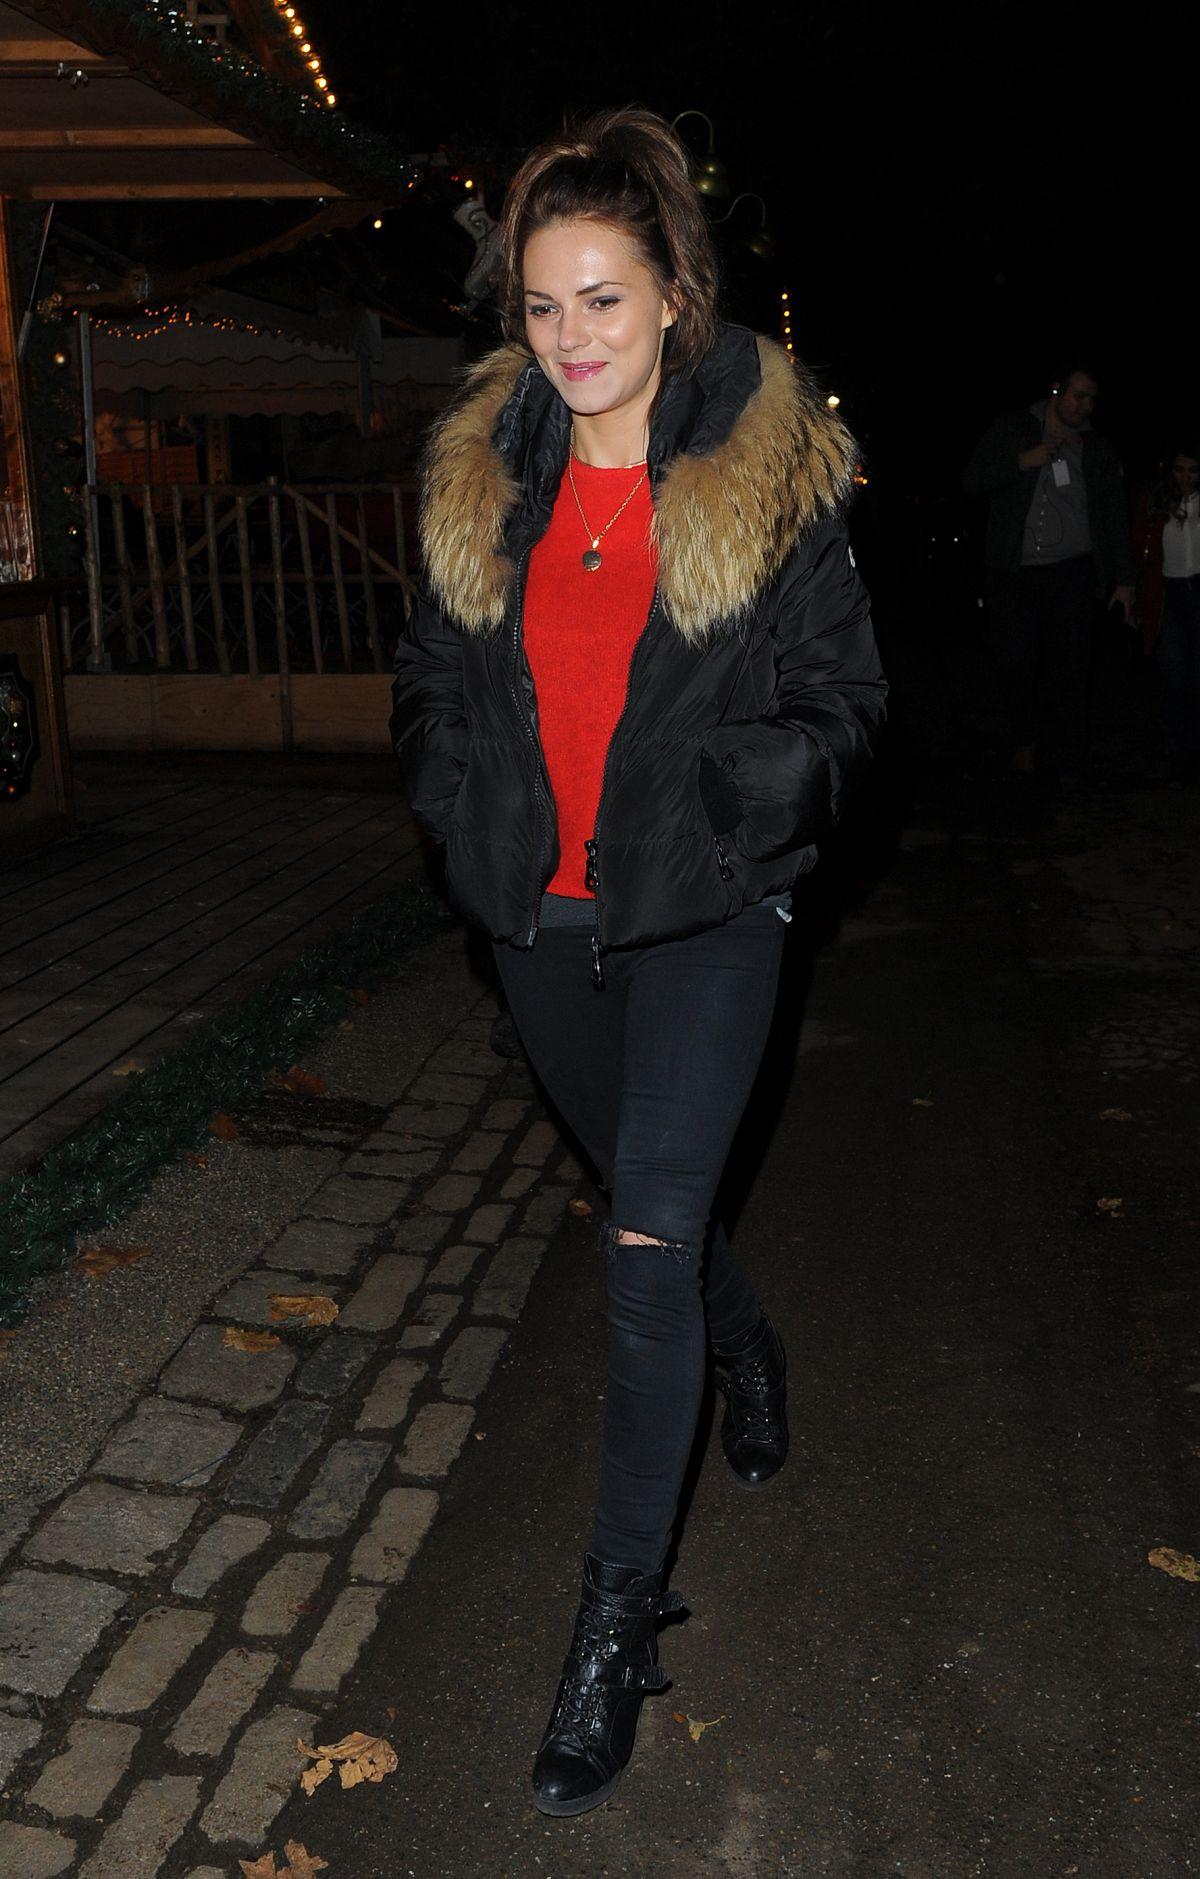 KARA TOINTON Arrives at Winter Wonderland in London